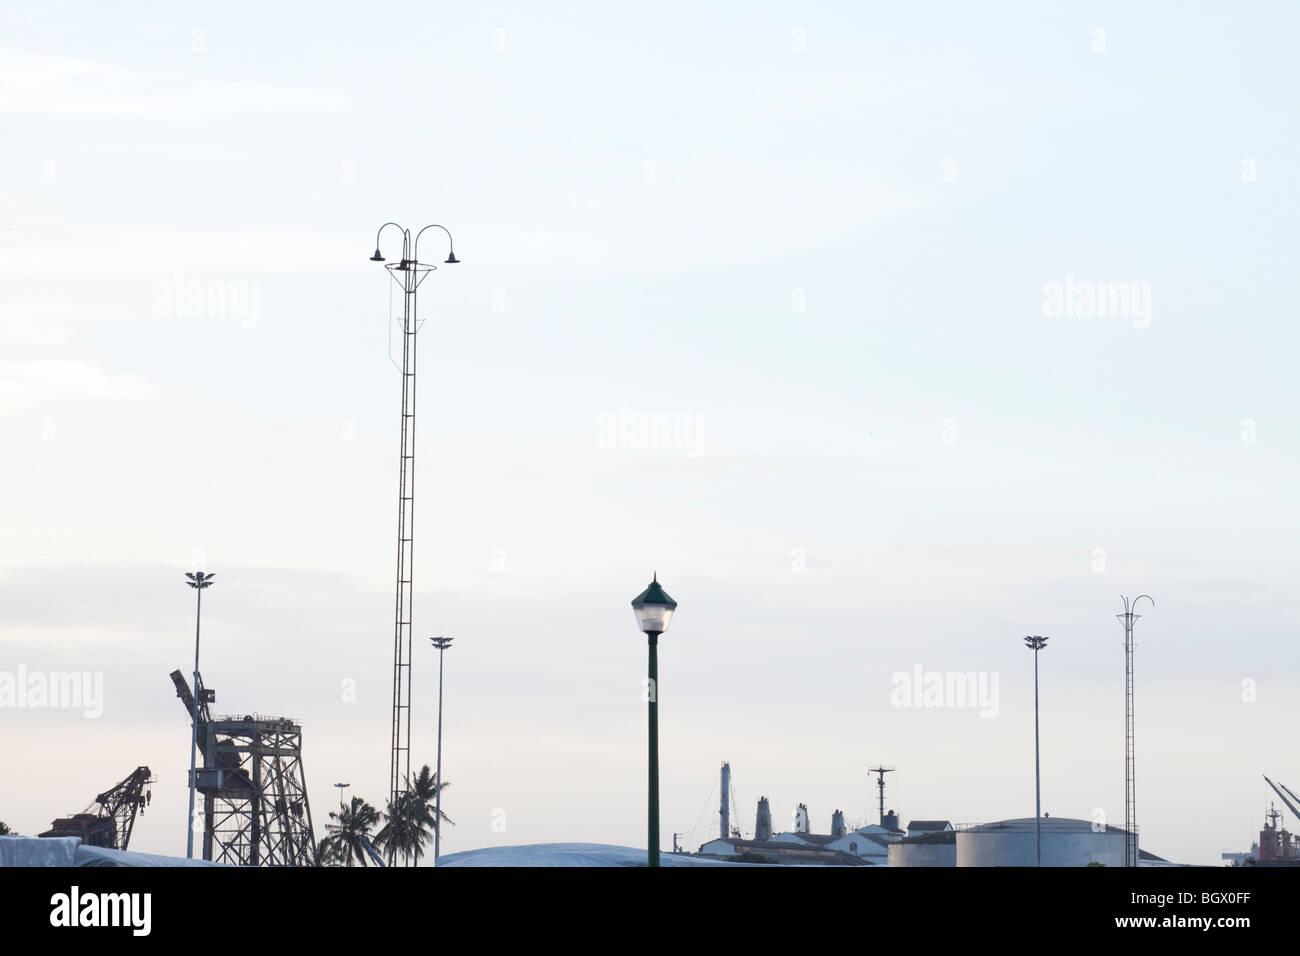 Minimal skyline with machinery and lanterns - Stock Image